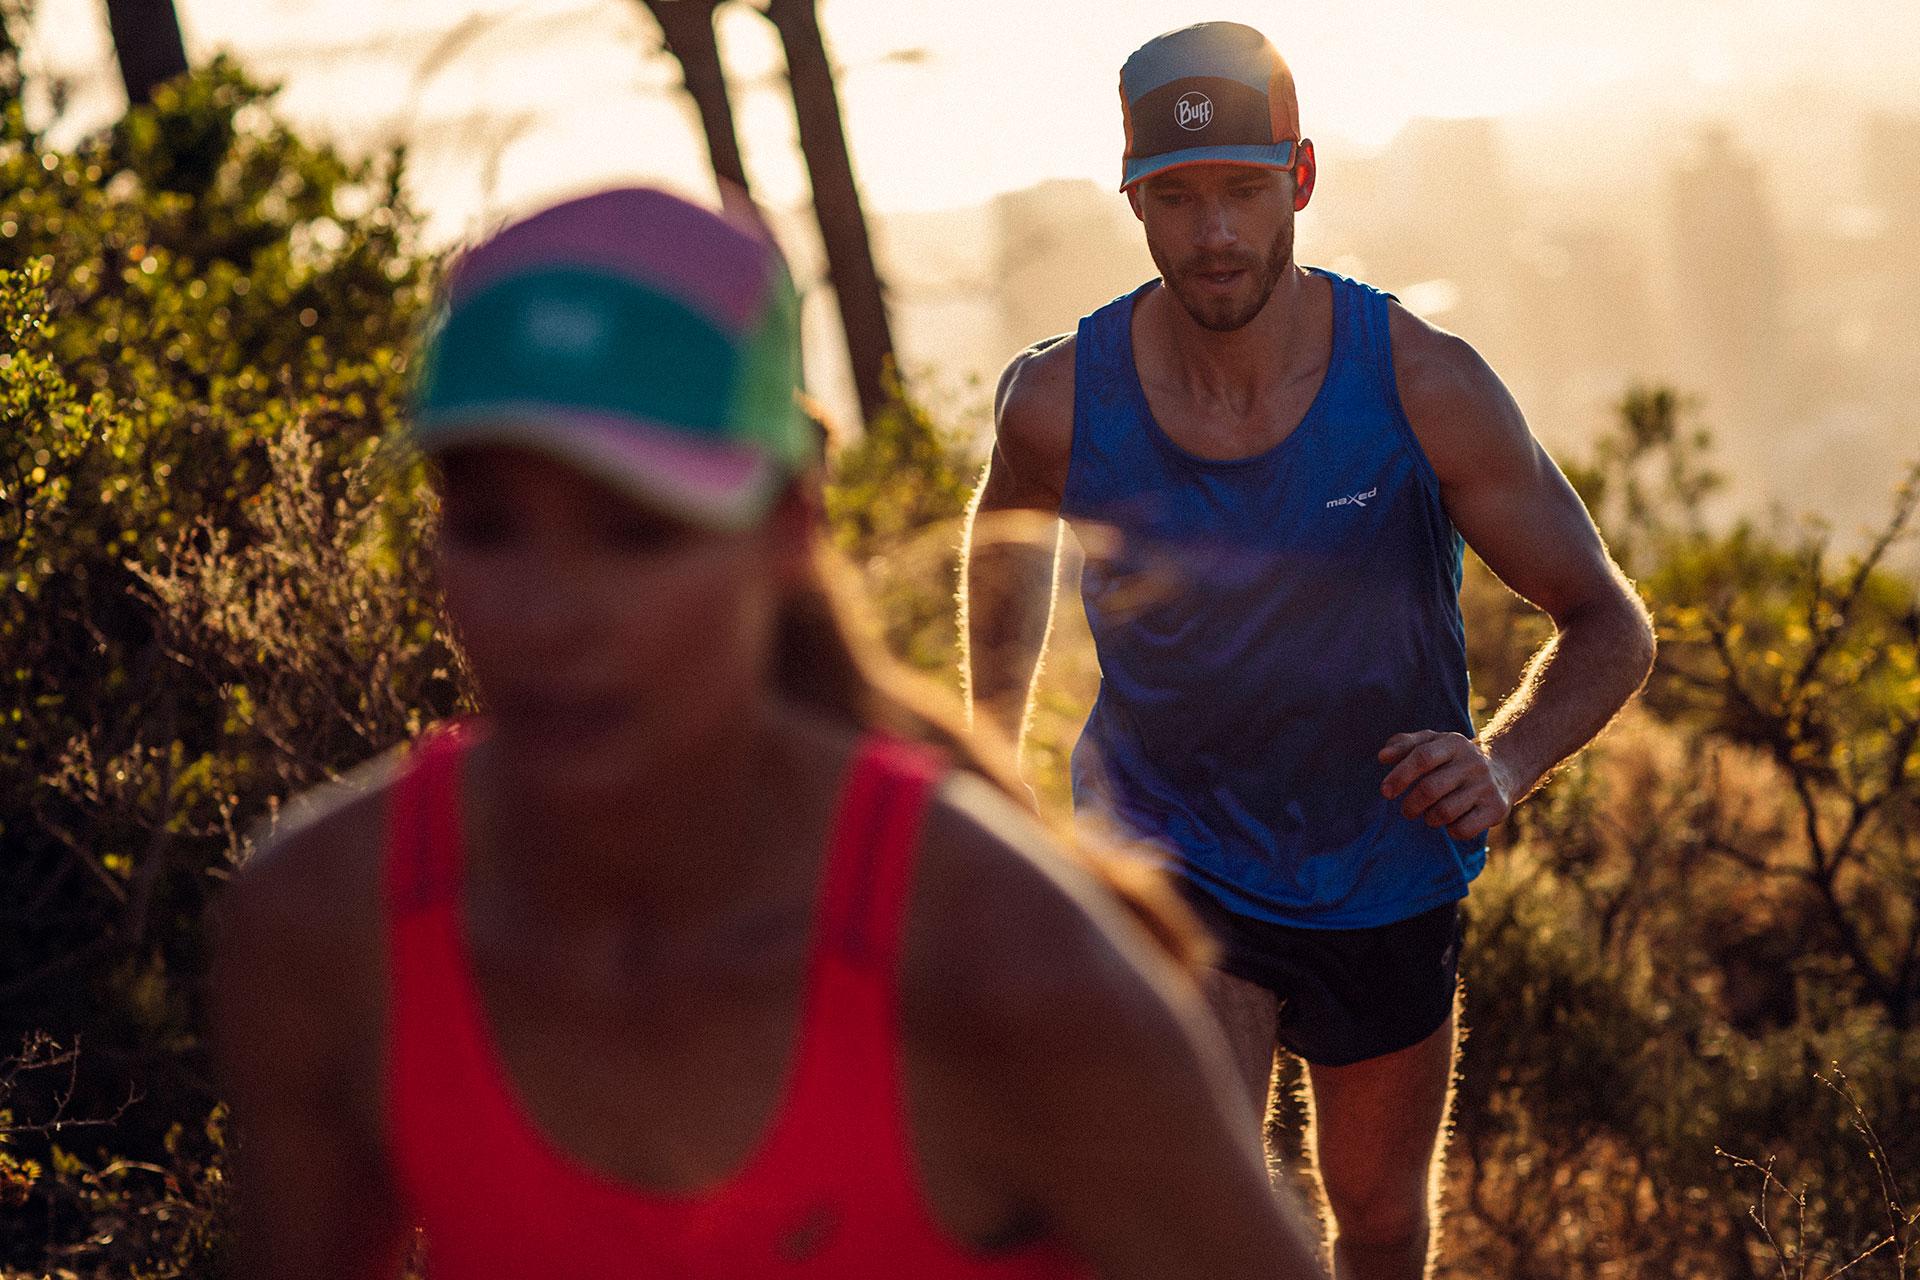 Sport Fotograf Laufen Fitness Bekleidung Sonnenaufgang Lifestyle